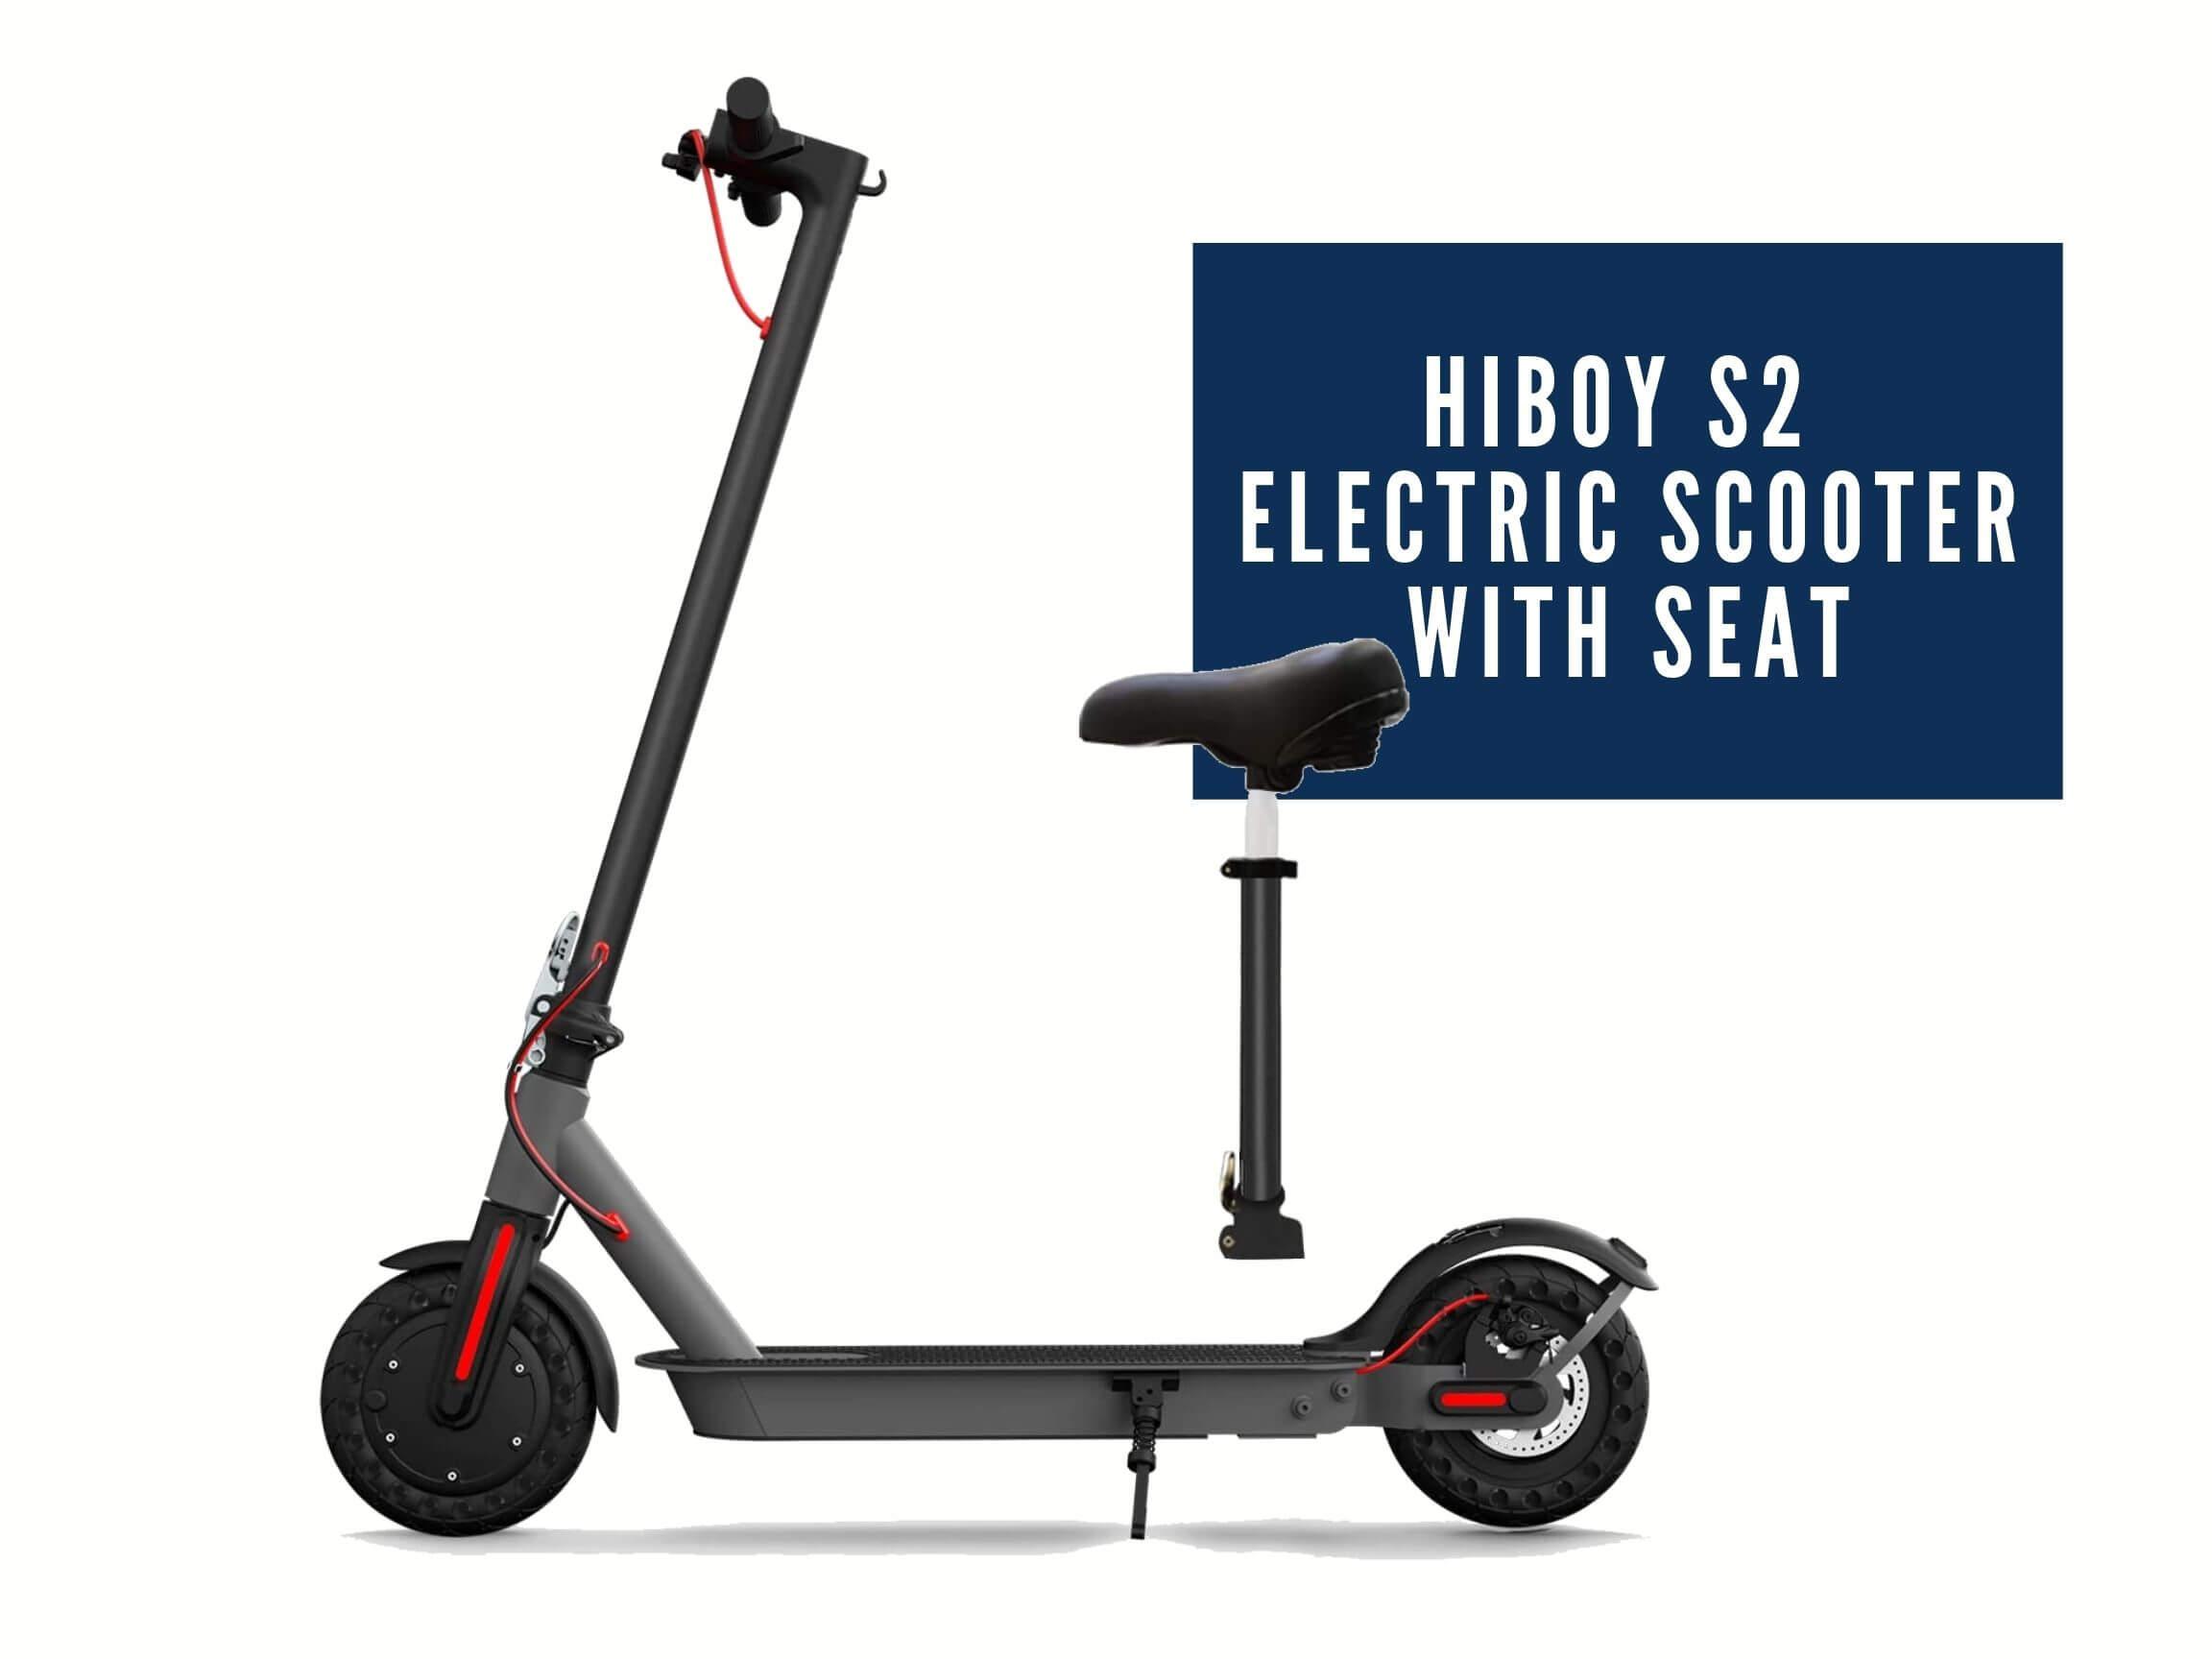 HiBoy S2